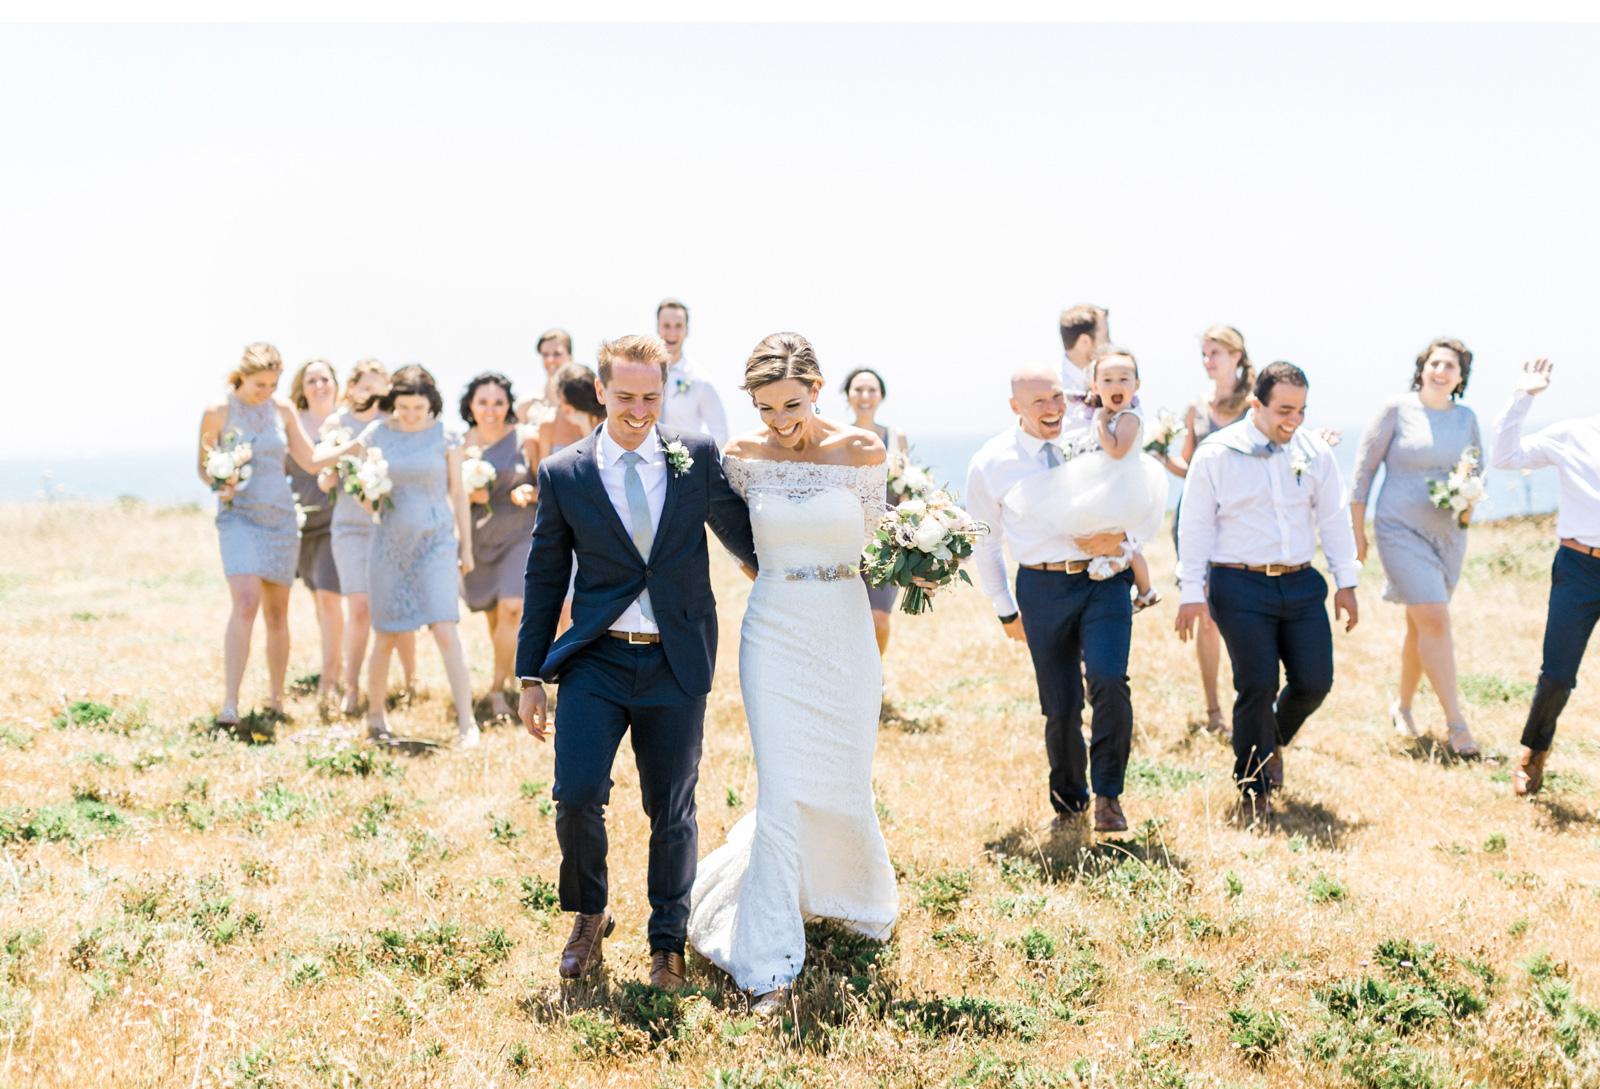 Mendocino-wedding-photographer-natalie-schutt-photography_17.jpg